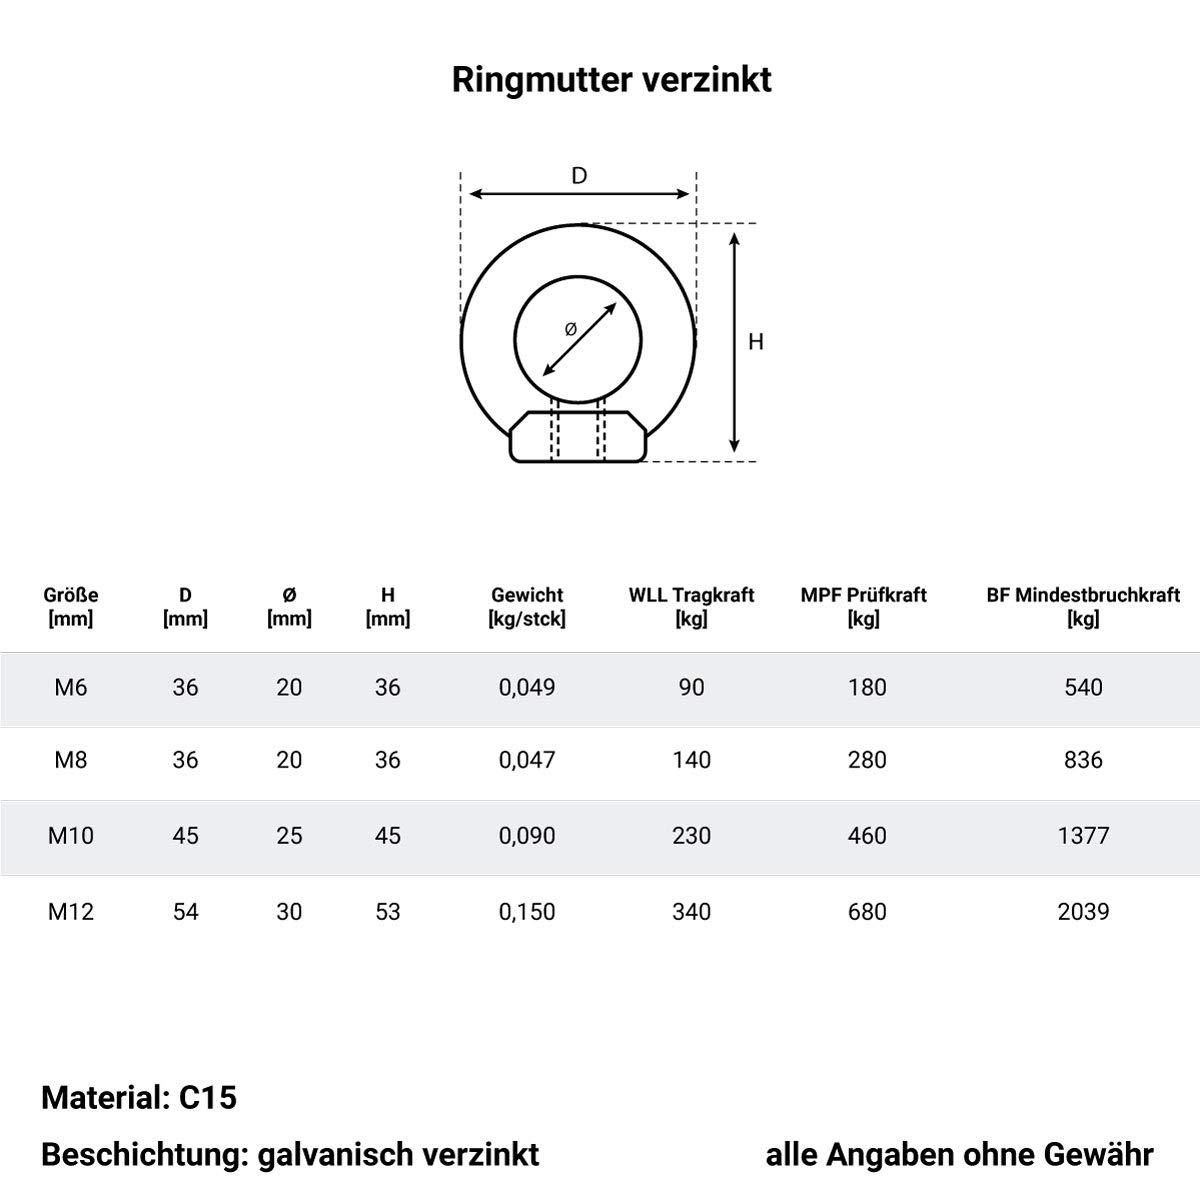 Seilwerk STANKE 5x Ringmutter M8 Ringsmutter 8 mm /Öse Mutter Auge verzinkt